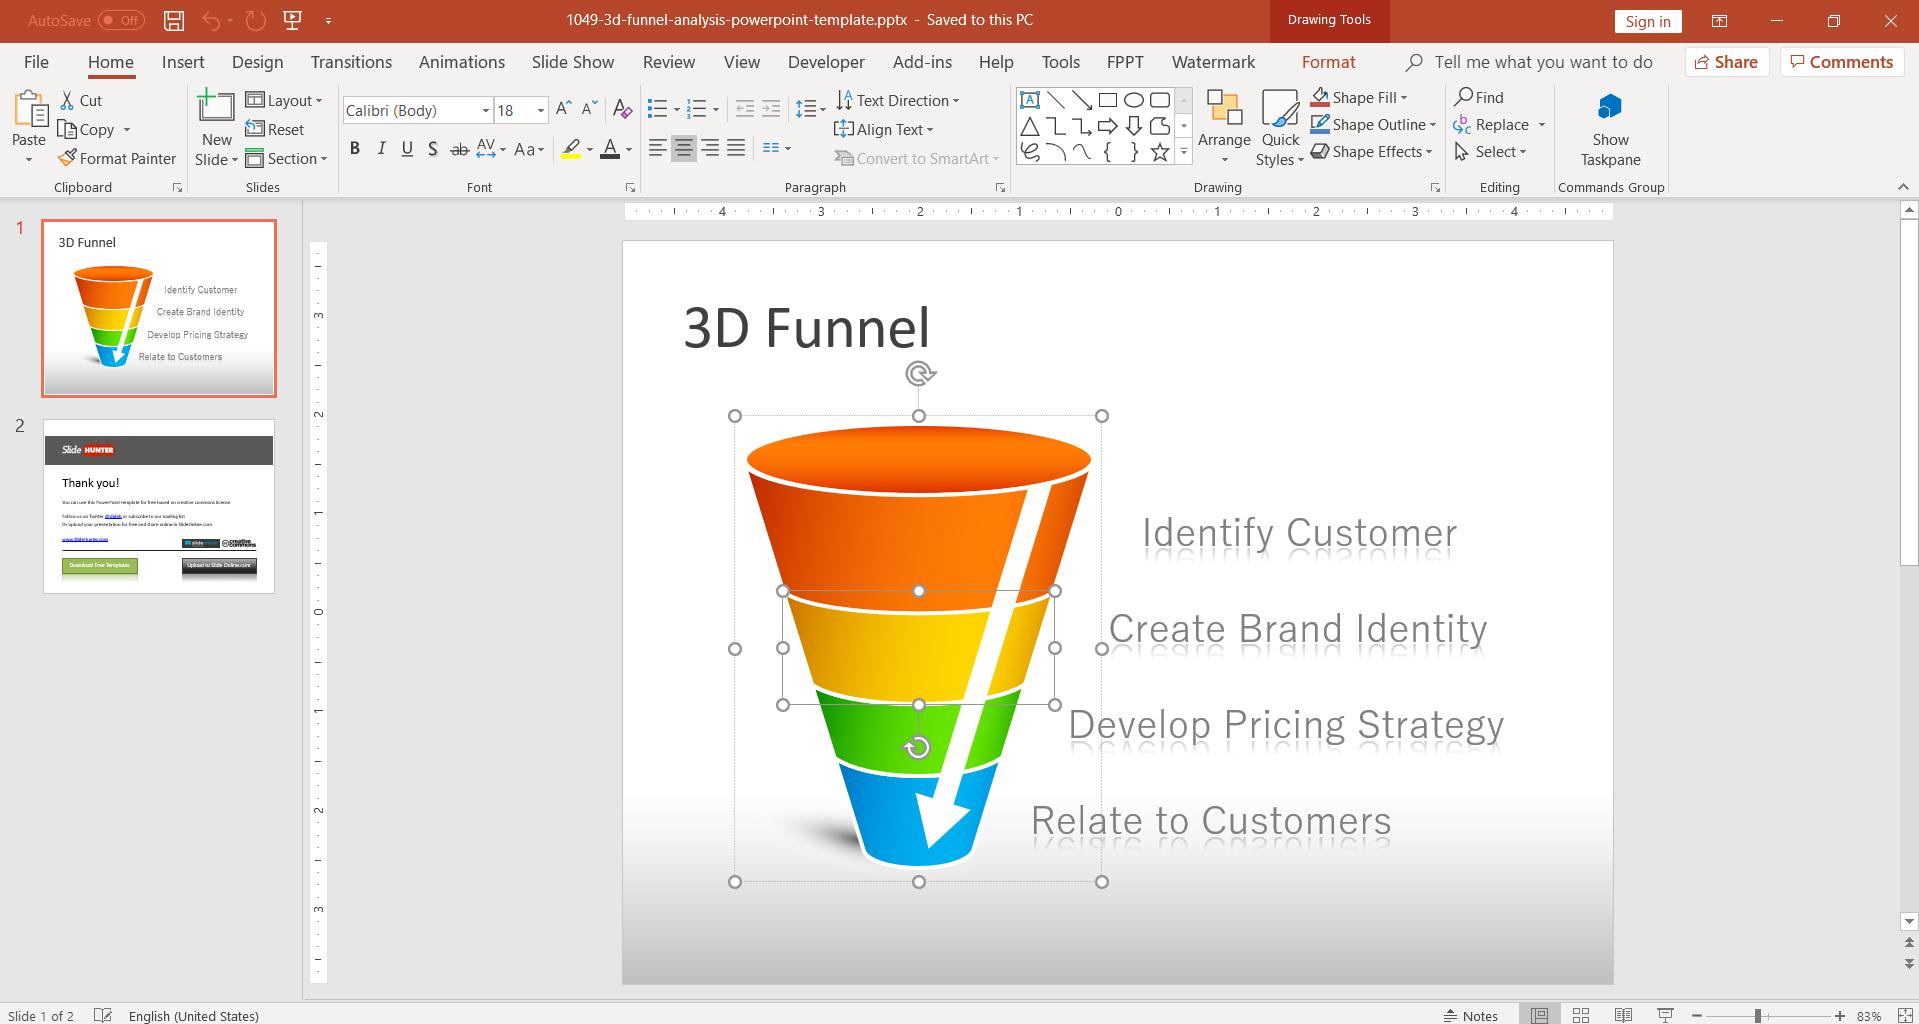 Editable 3D Funnel PowerPoint template